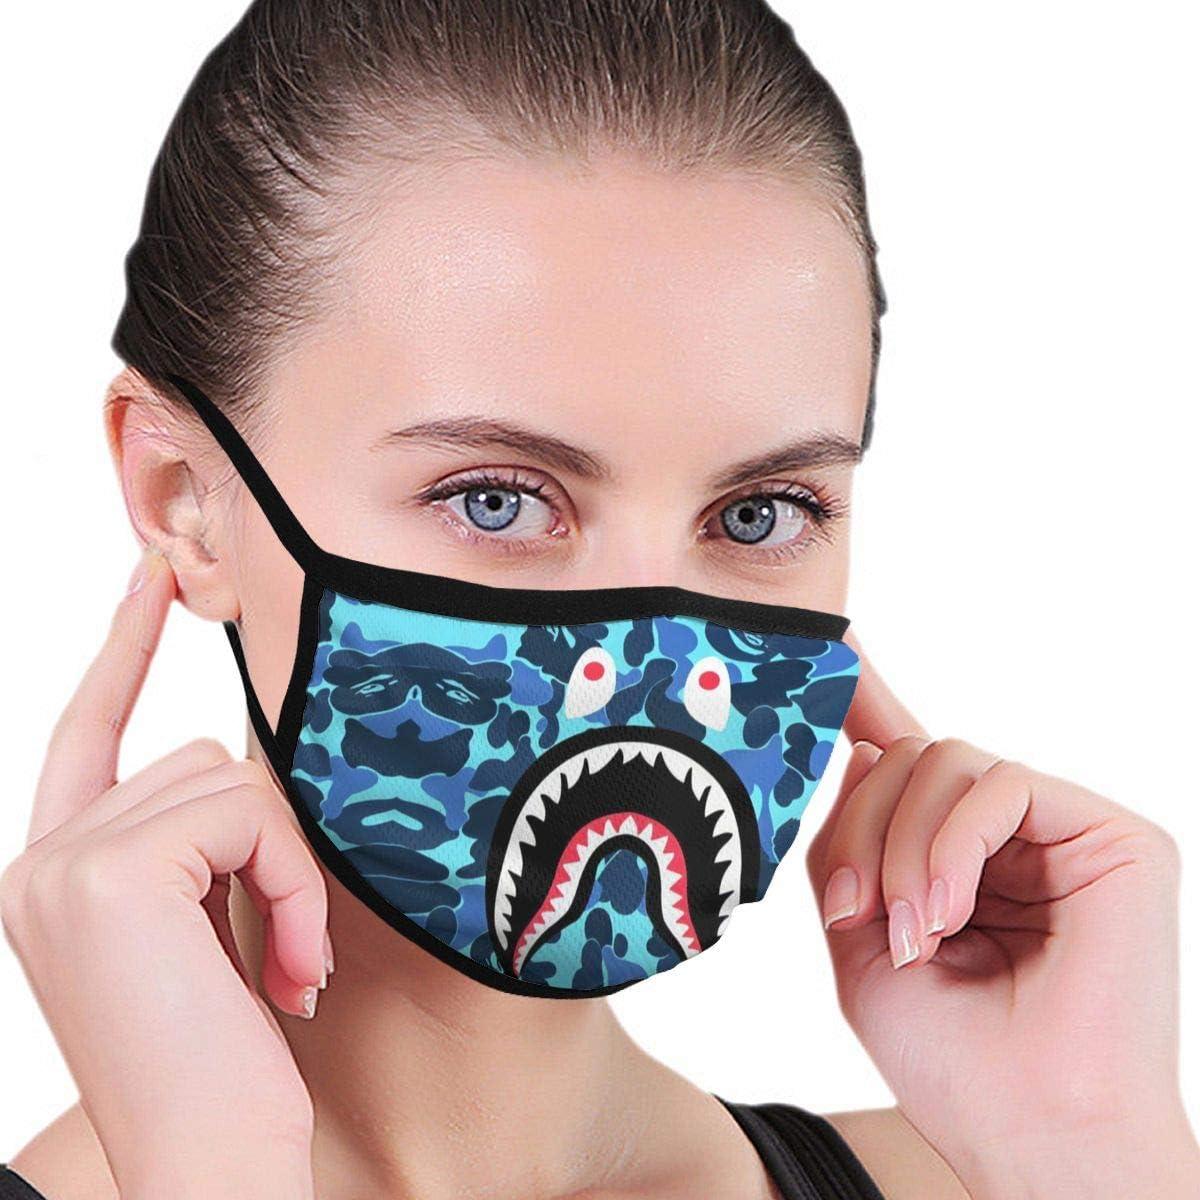 Shark Bandana Anti-dust Neck Gaiter Bape Face Mask Balaclava Scarf for Outdoors Camping